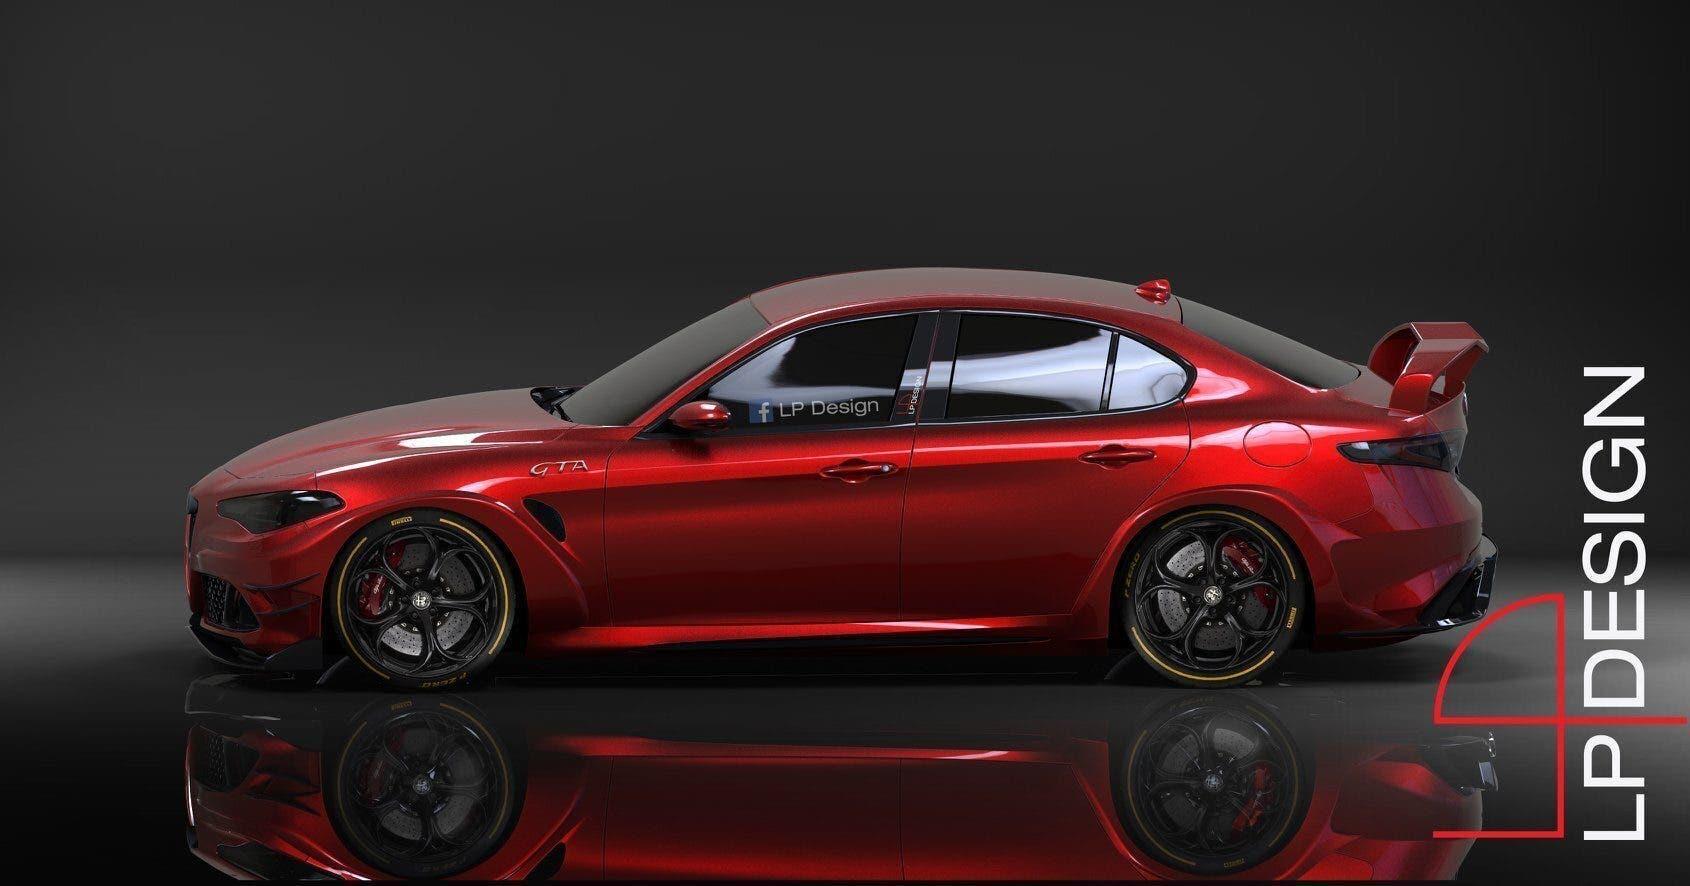 Alfa Romeo Giulia GTA LP Design